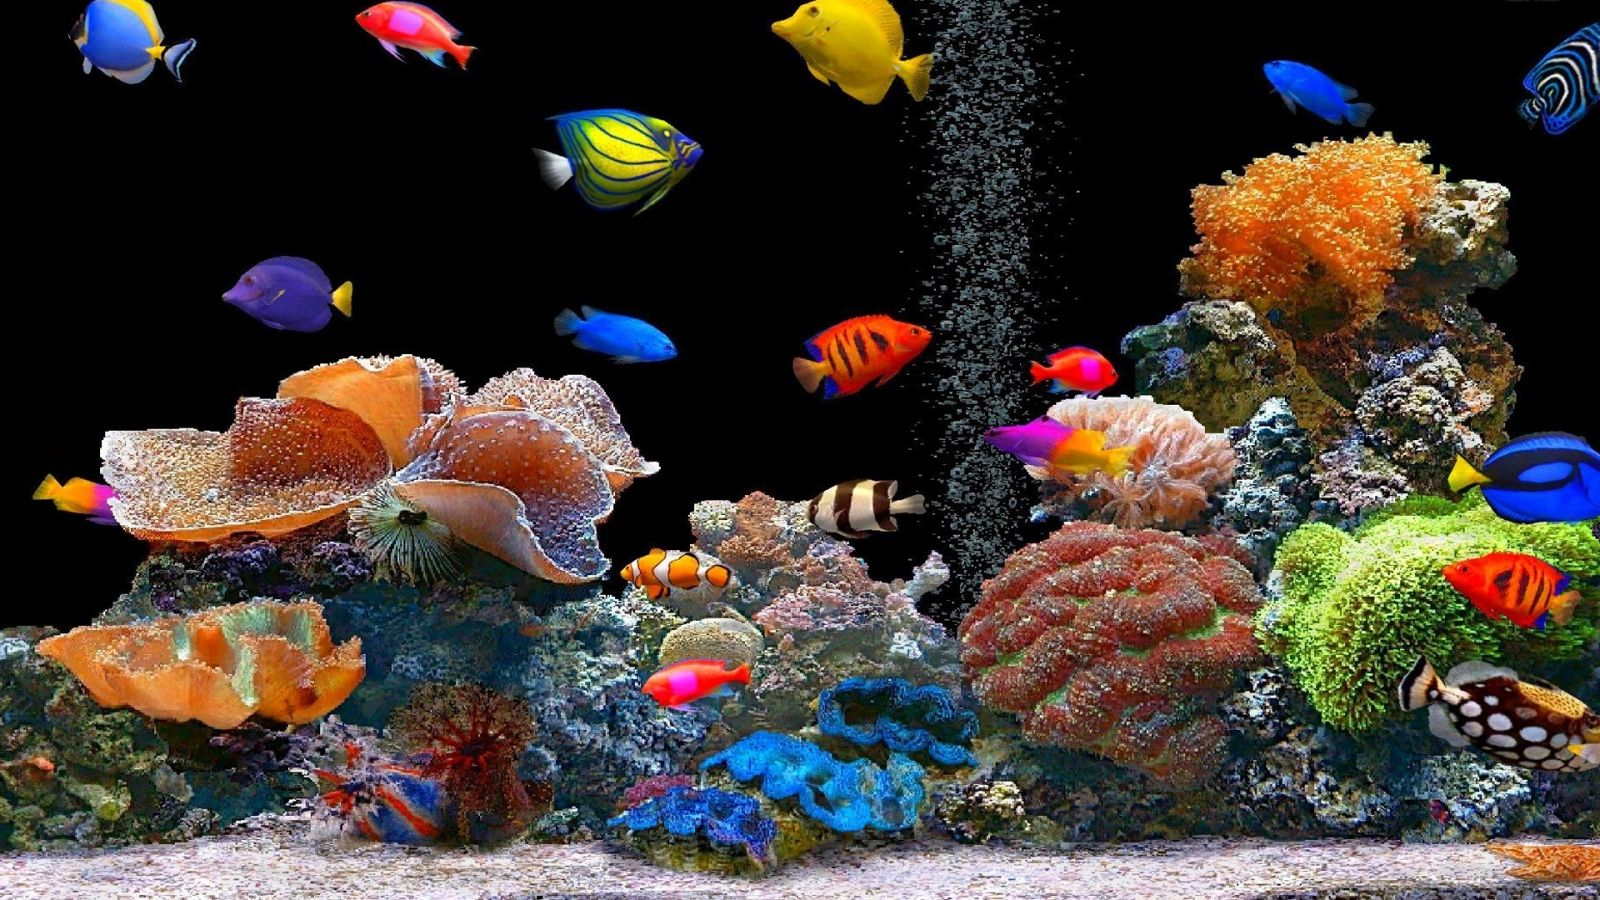 Paisajes Marinos Buscar Con Google Aquarium Live Wallpaper Saltwater Fish Tanks Fish Wallpaper